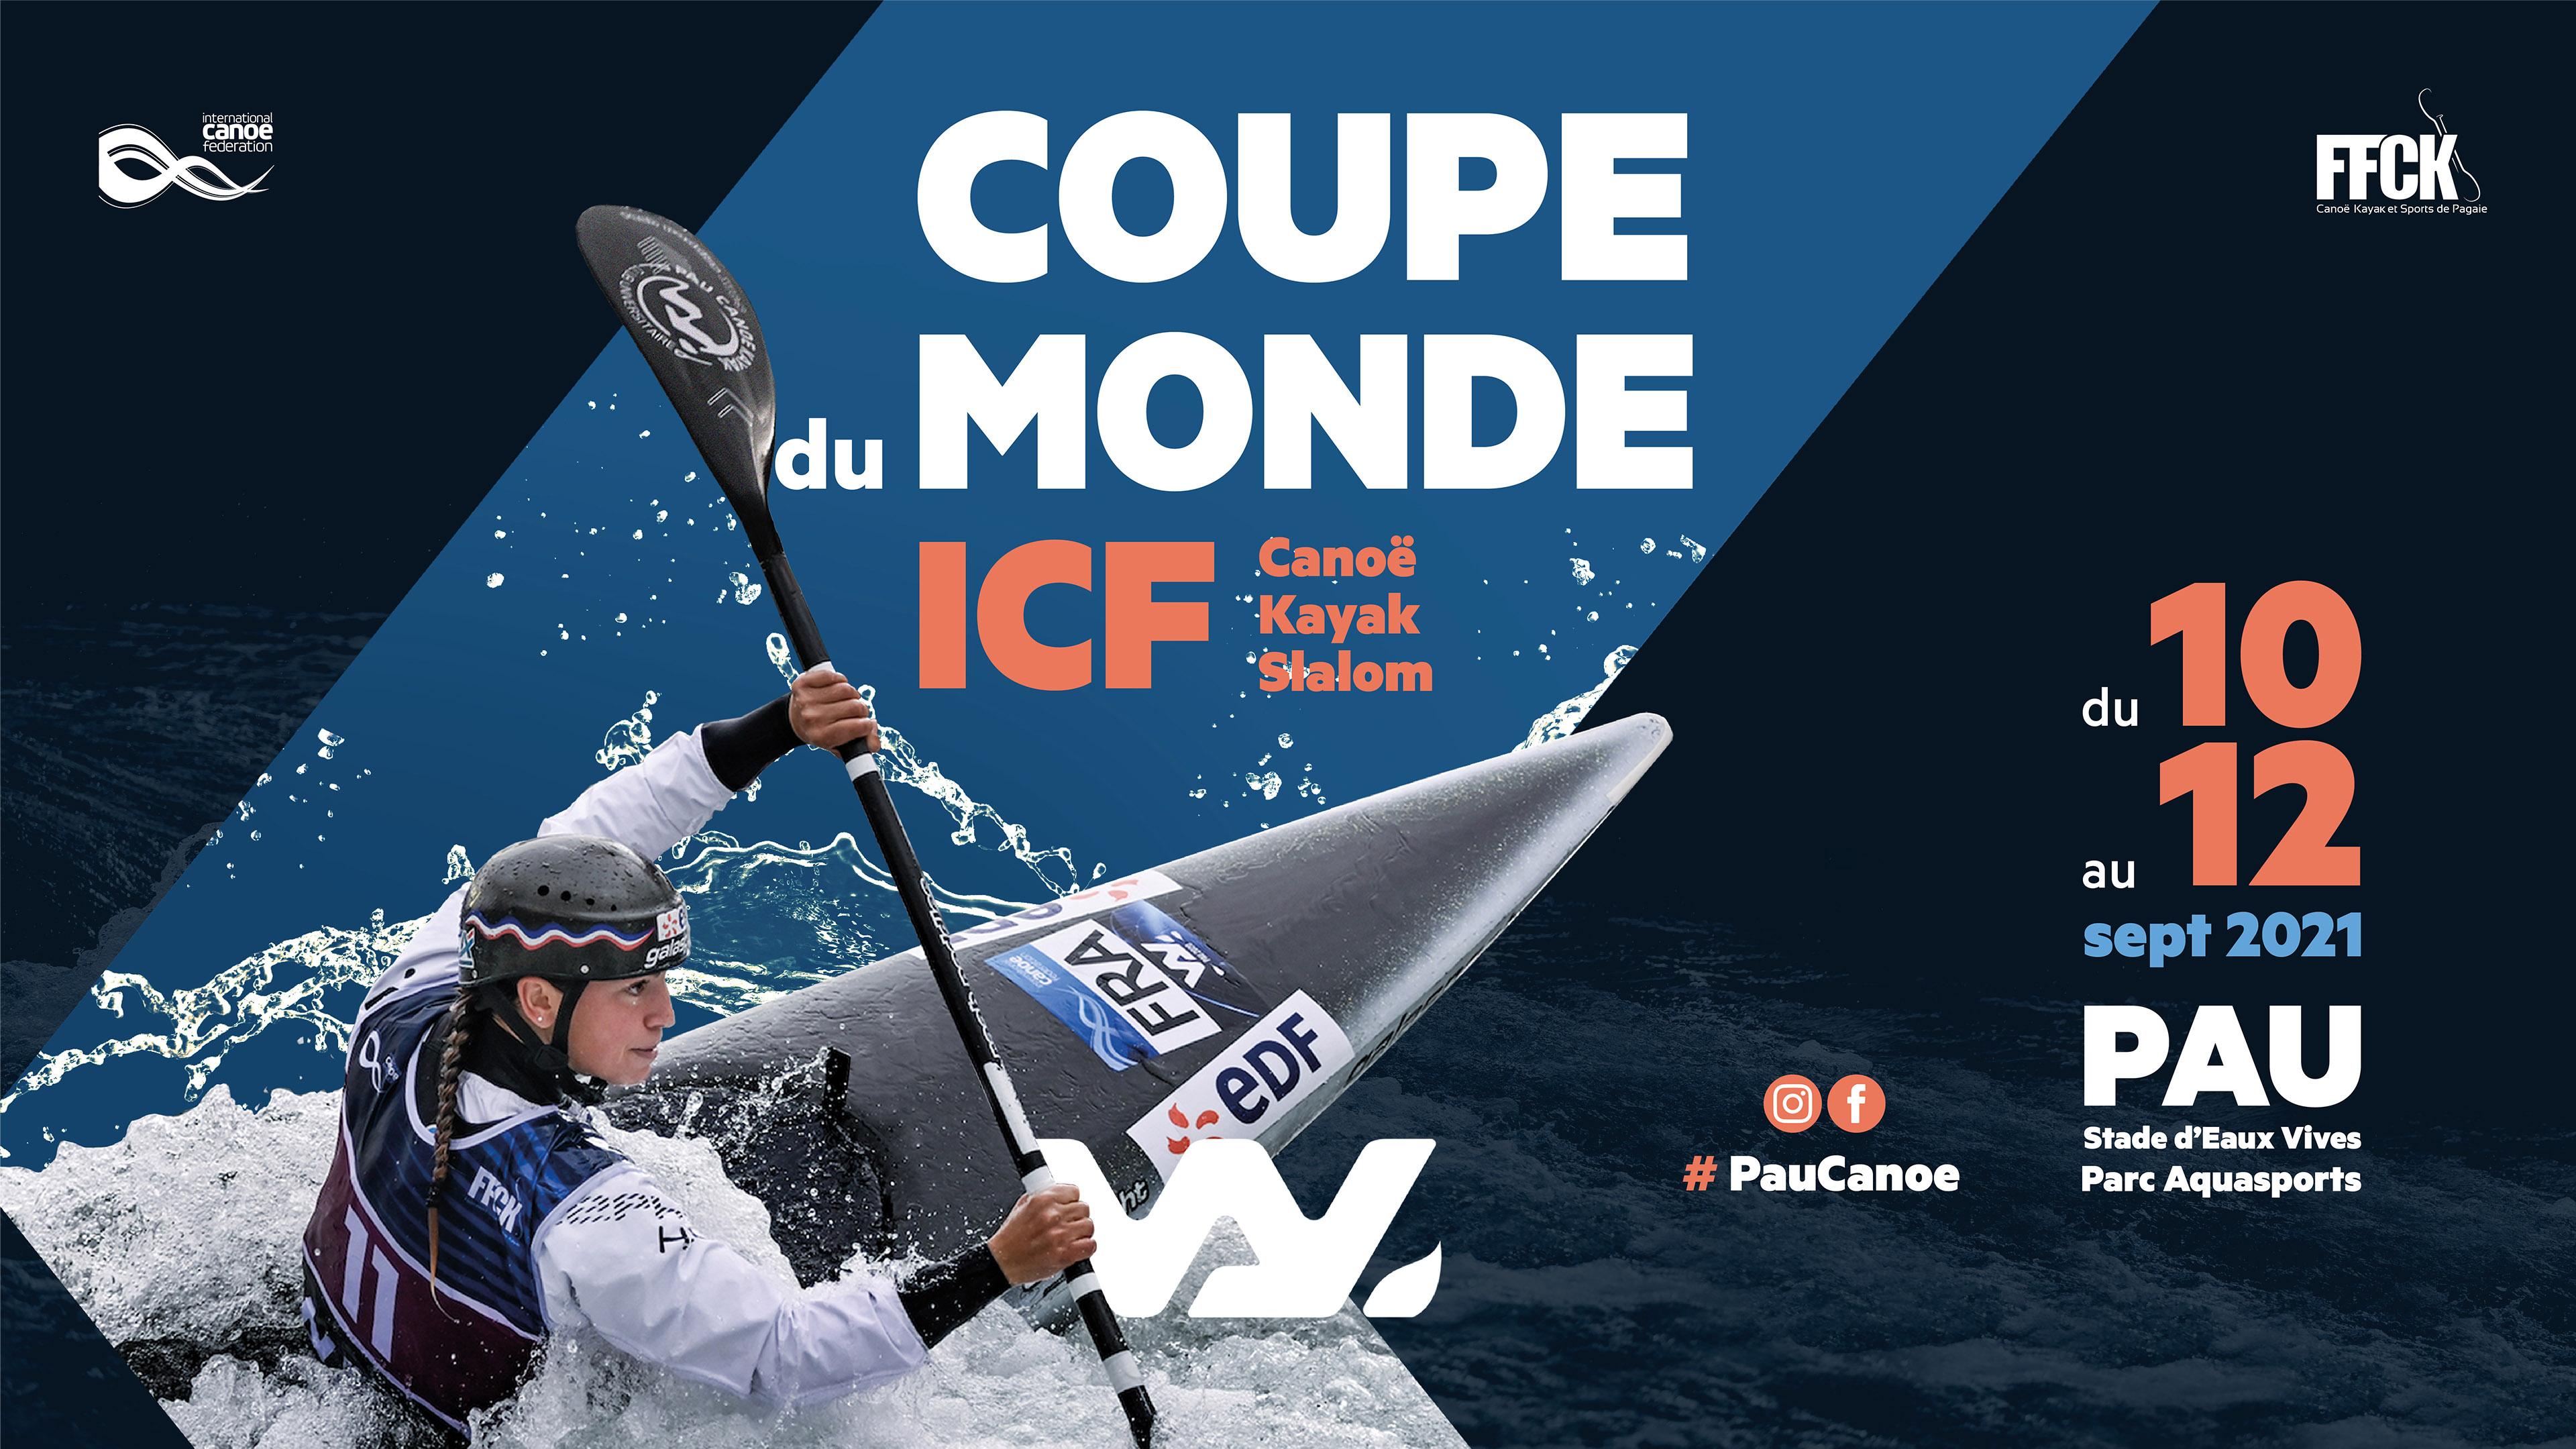 Coupe du monde ICF Canoë Kayak Slalom